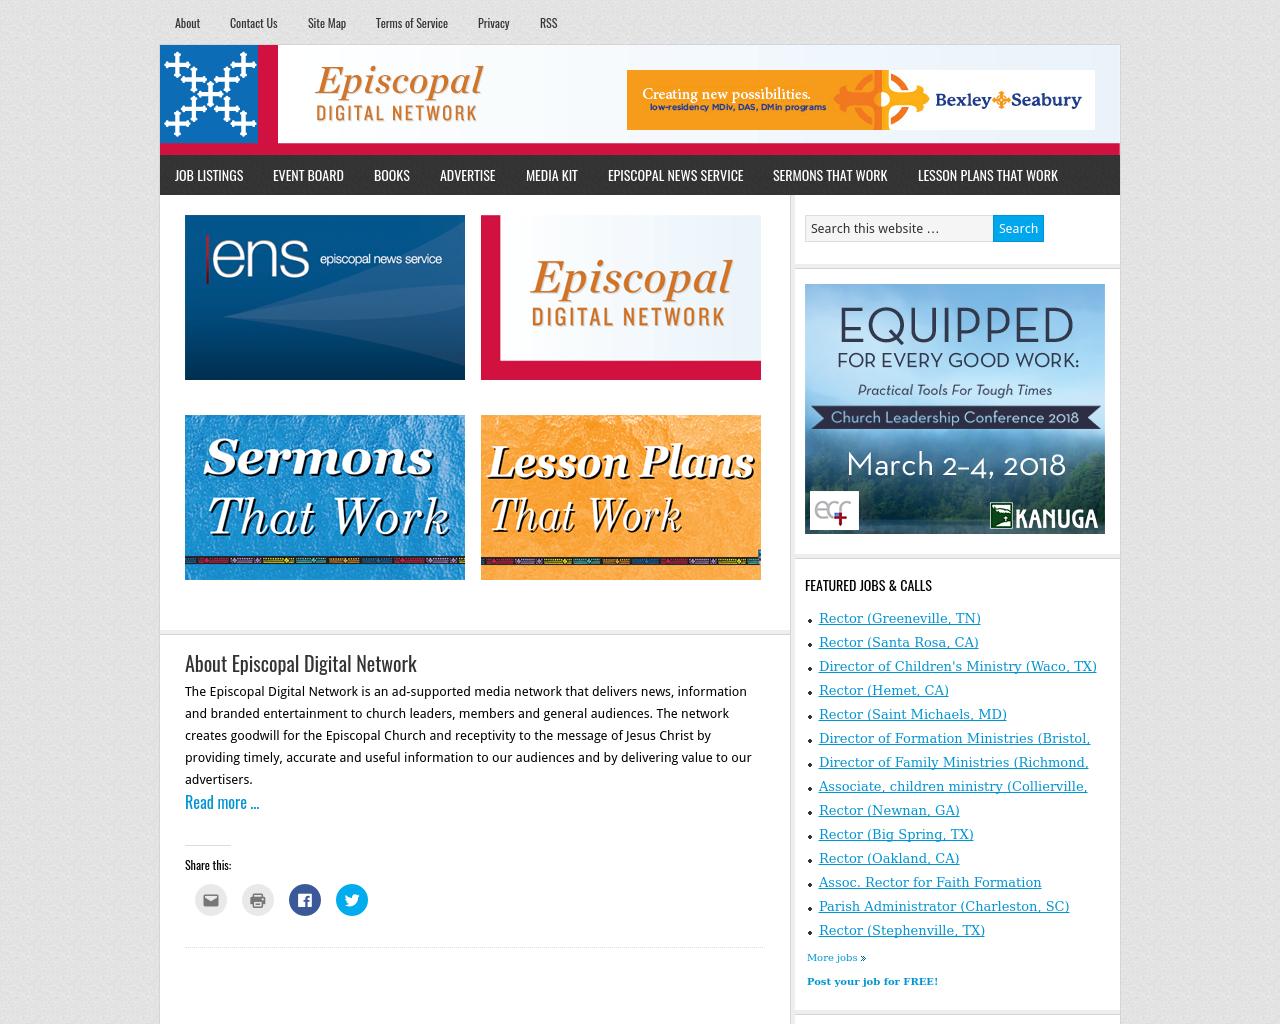 Episcopal-Digital-Network-Advertising-Reviews-Pricing